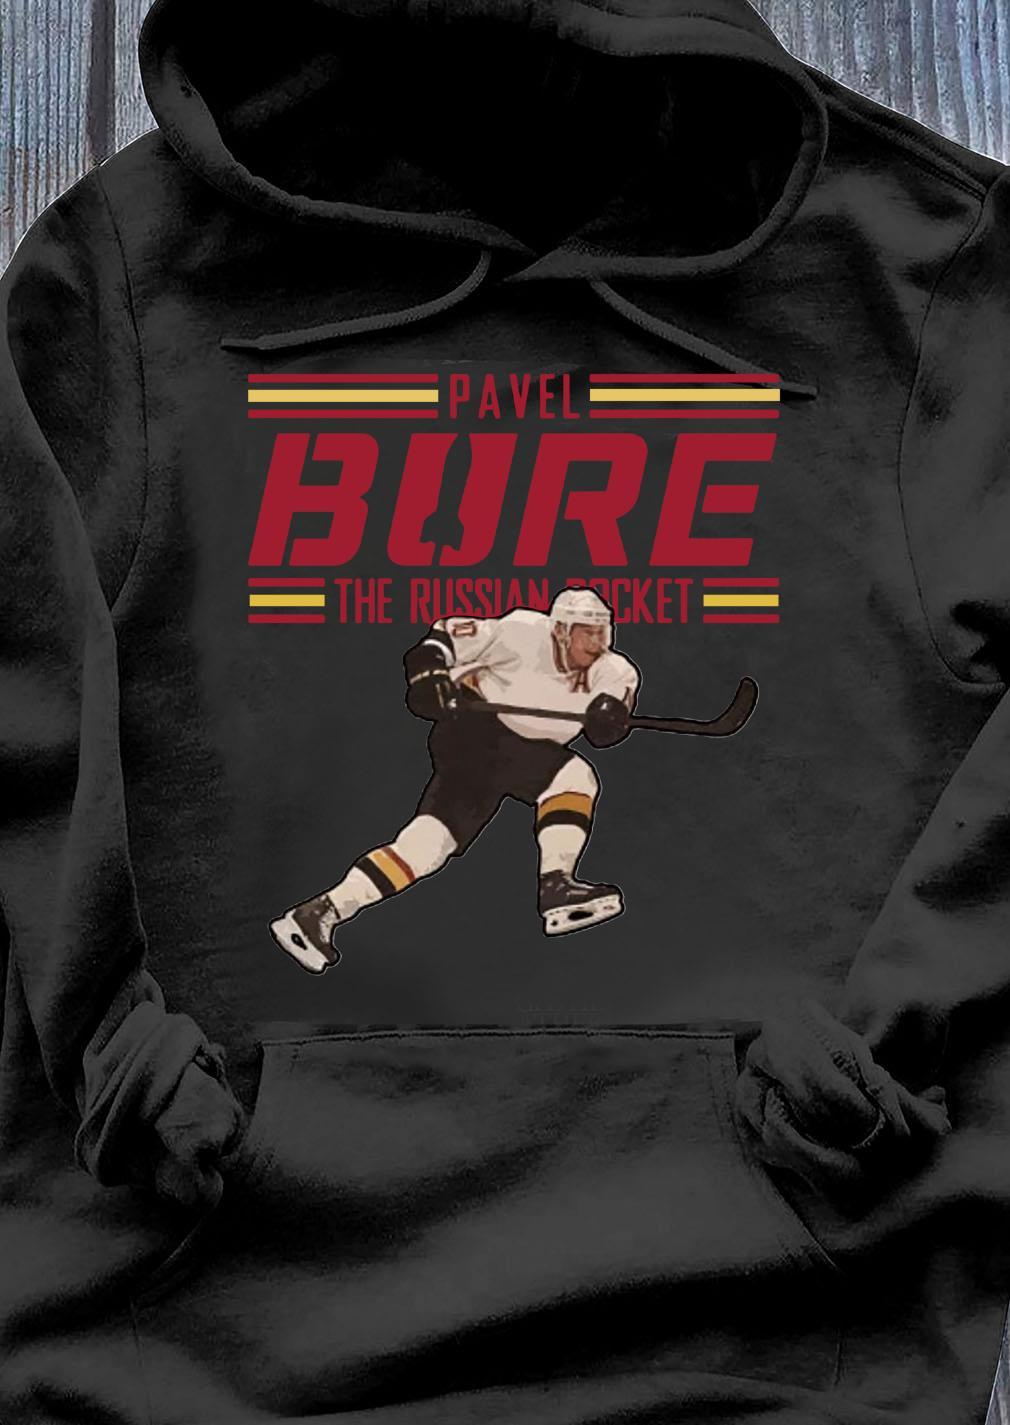 Pavel Bure The Russian Rocket Play T-Shirt Hoodie